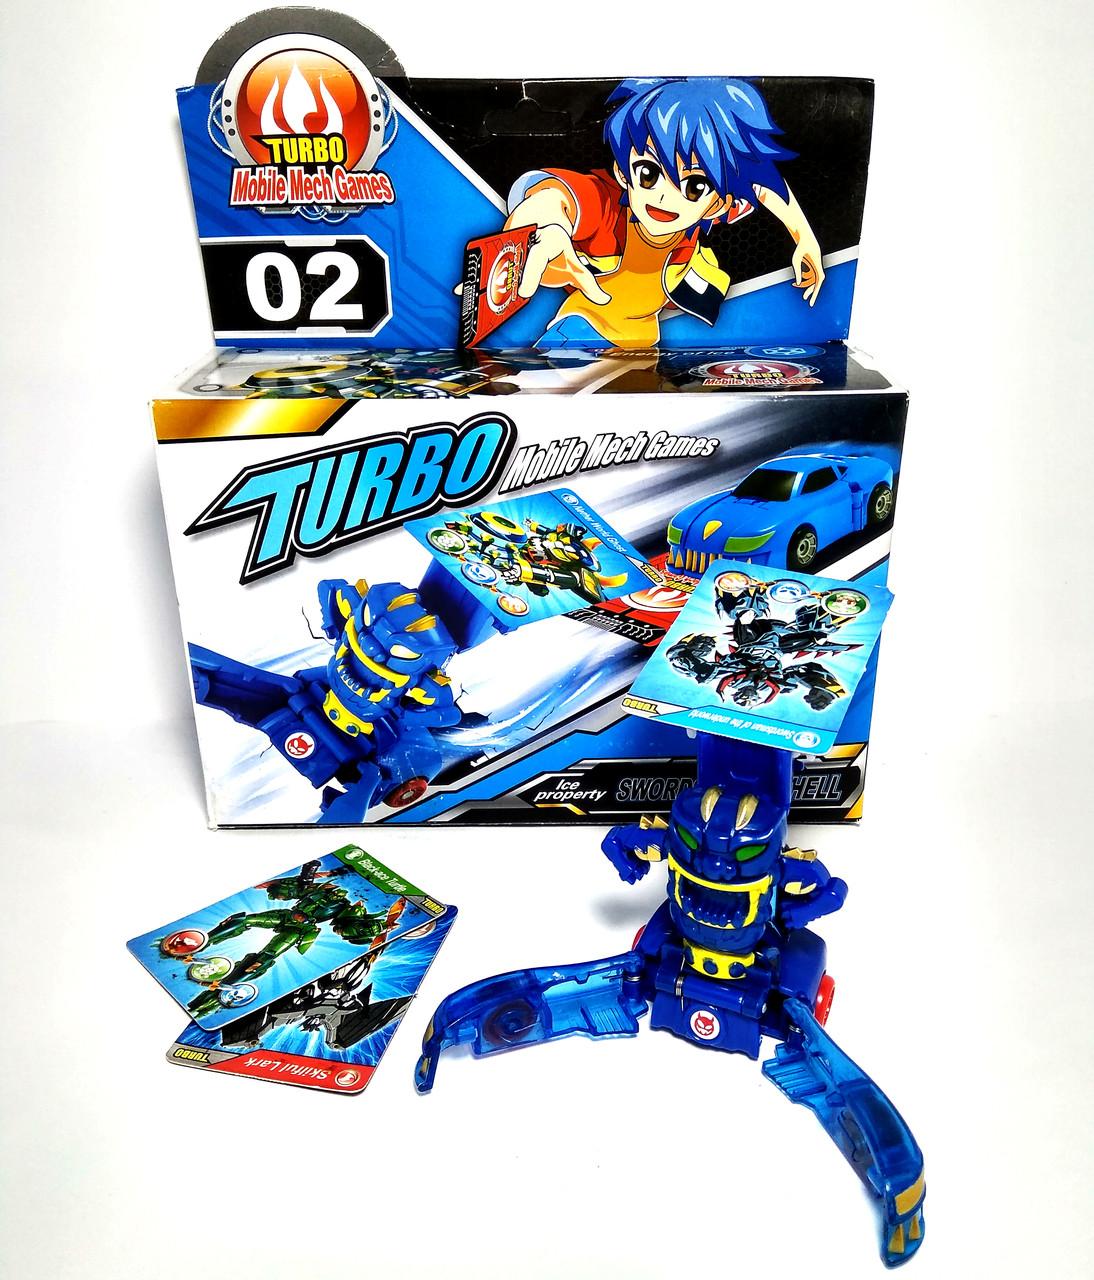 Робот-трансформер 02 Turbo Mobile Mech Games Shantou Gepai B1516795